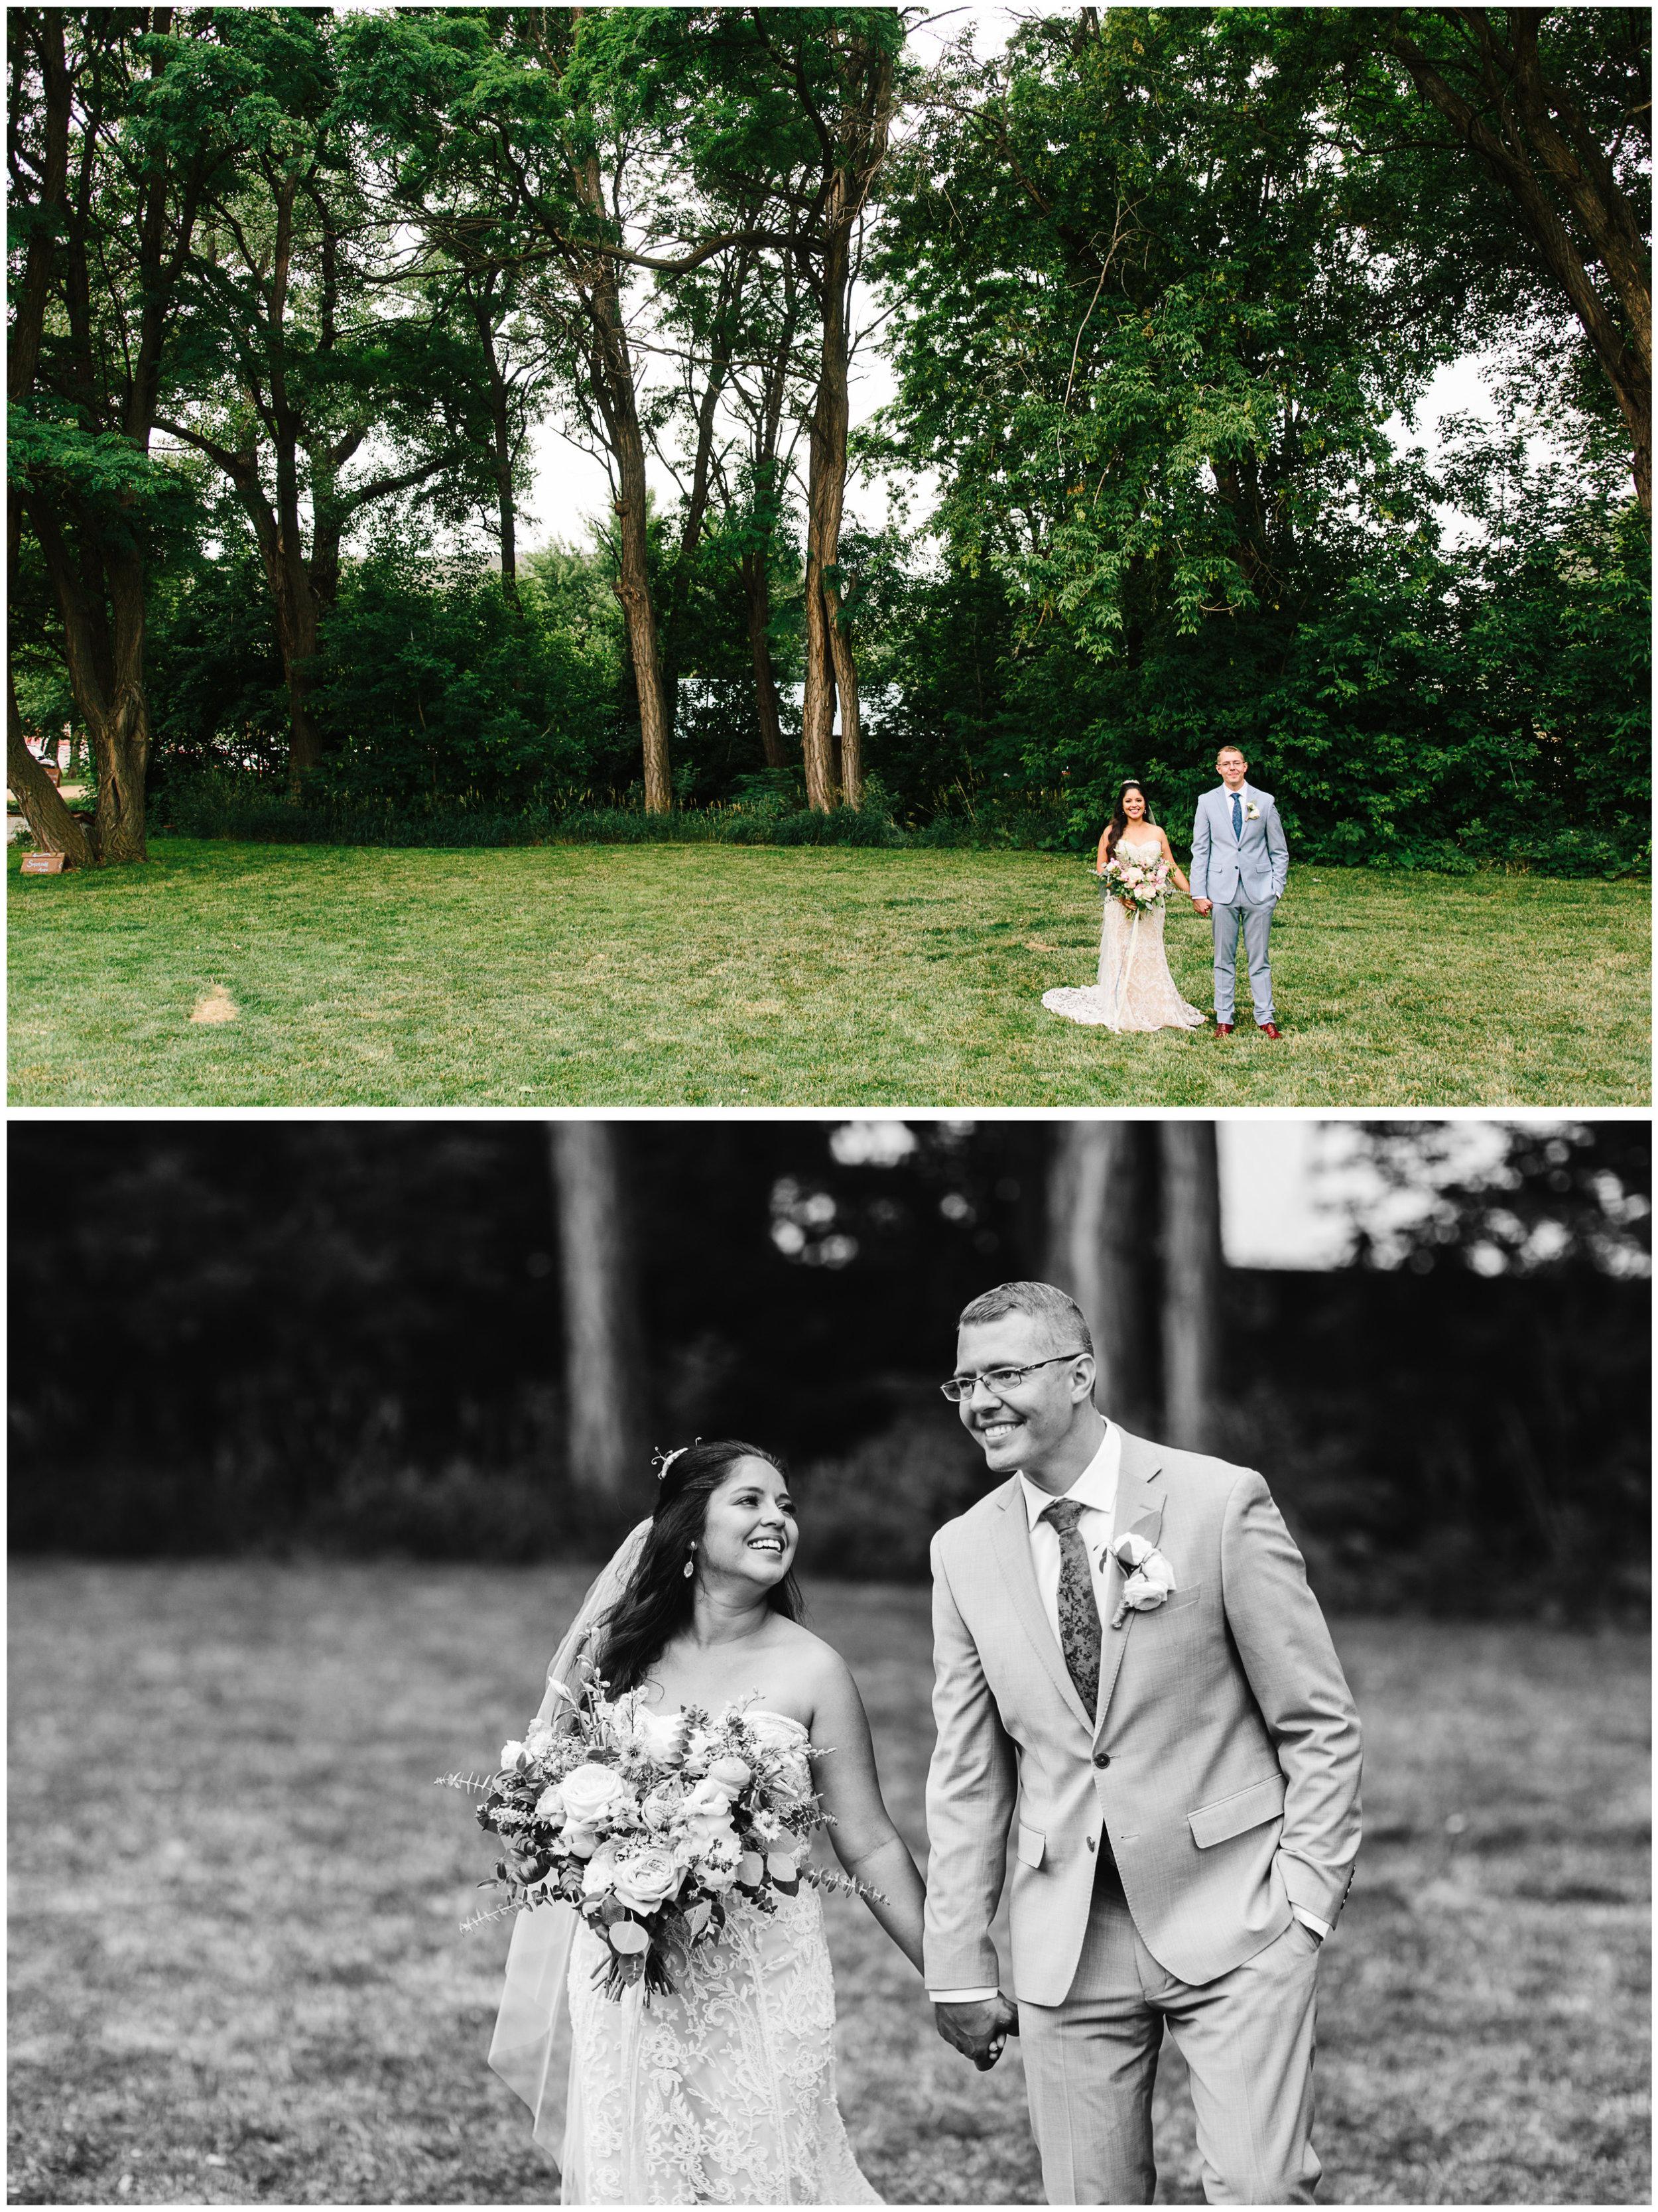 lyons_farmette_wedding_41.jpg